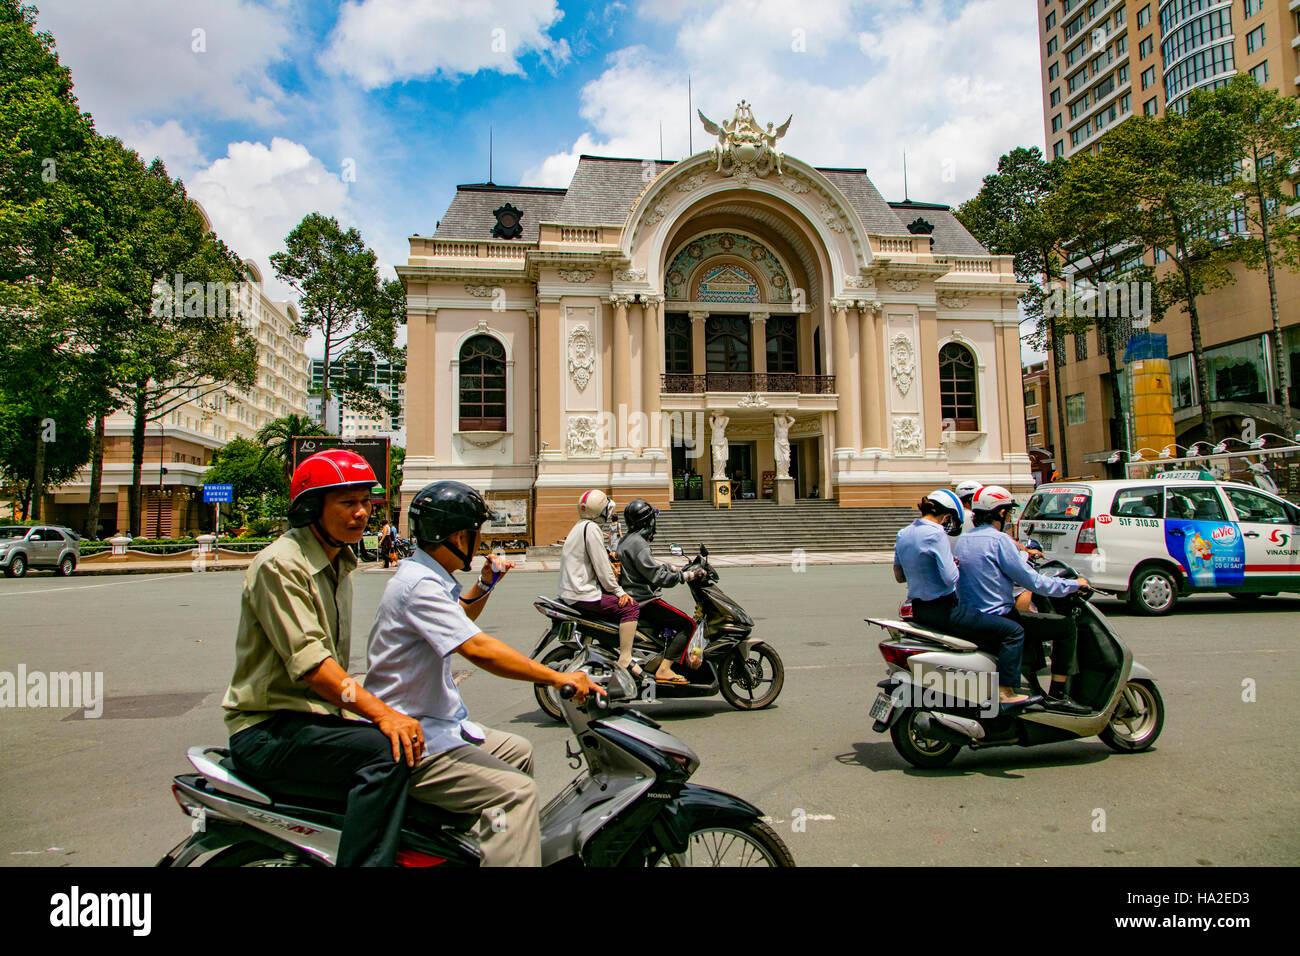 Opera House, Saigon, Vietnam, Asia - Stock Image